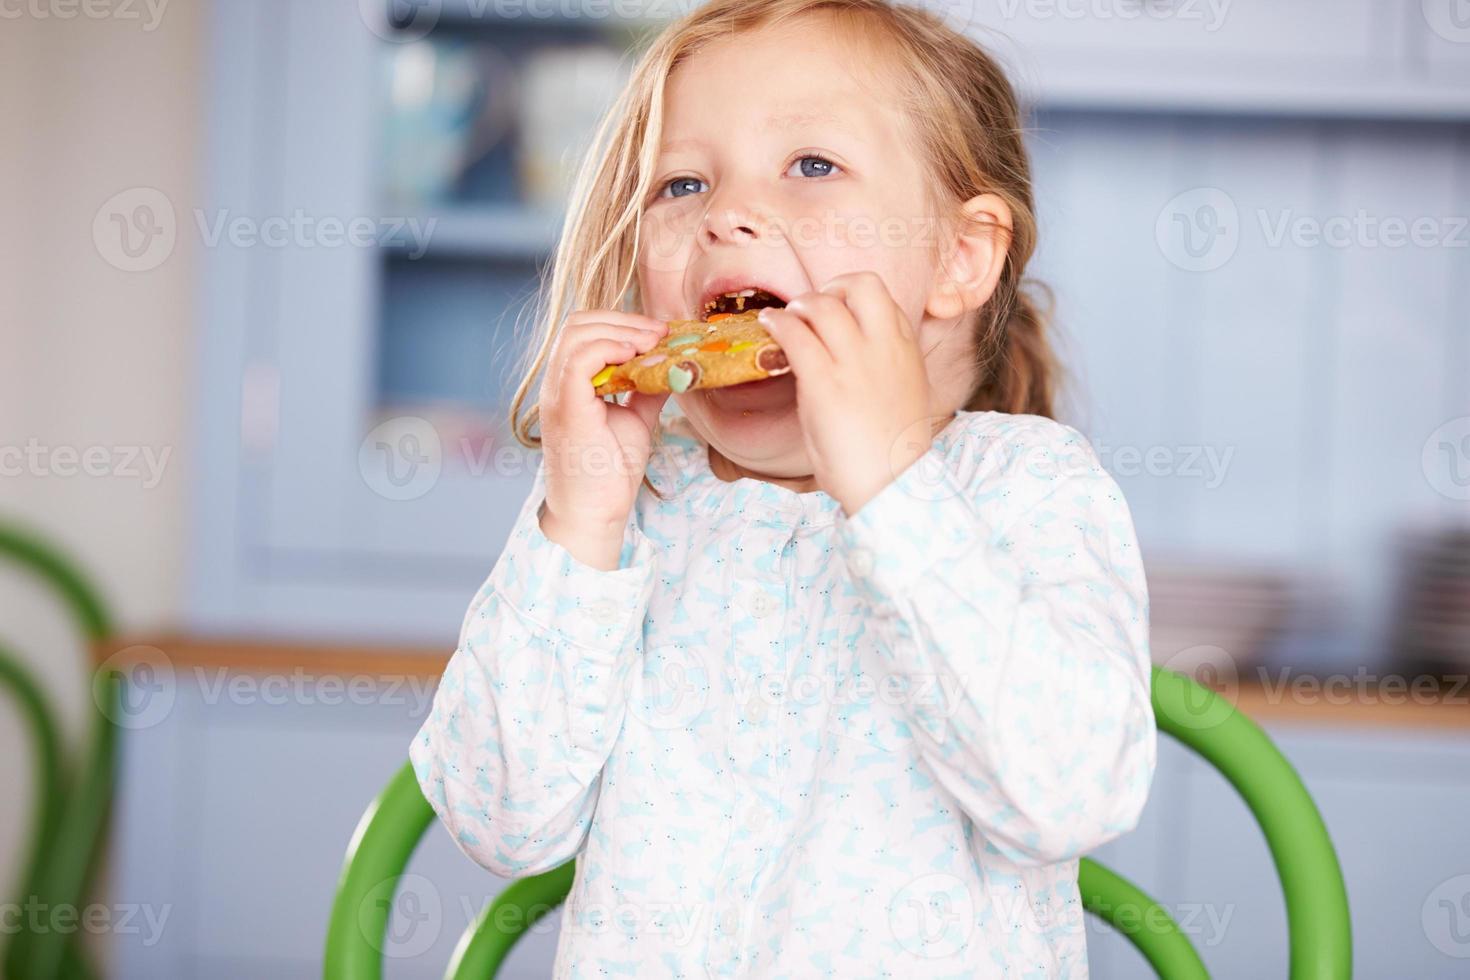 jeune fille assise à table manger des biscuits photo